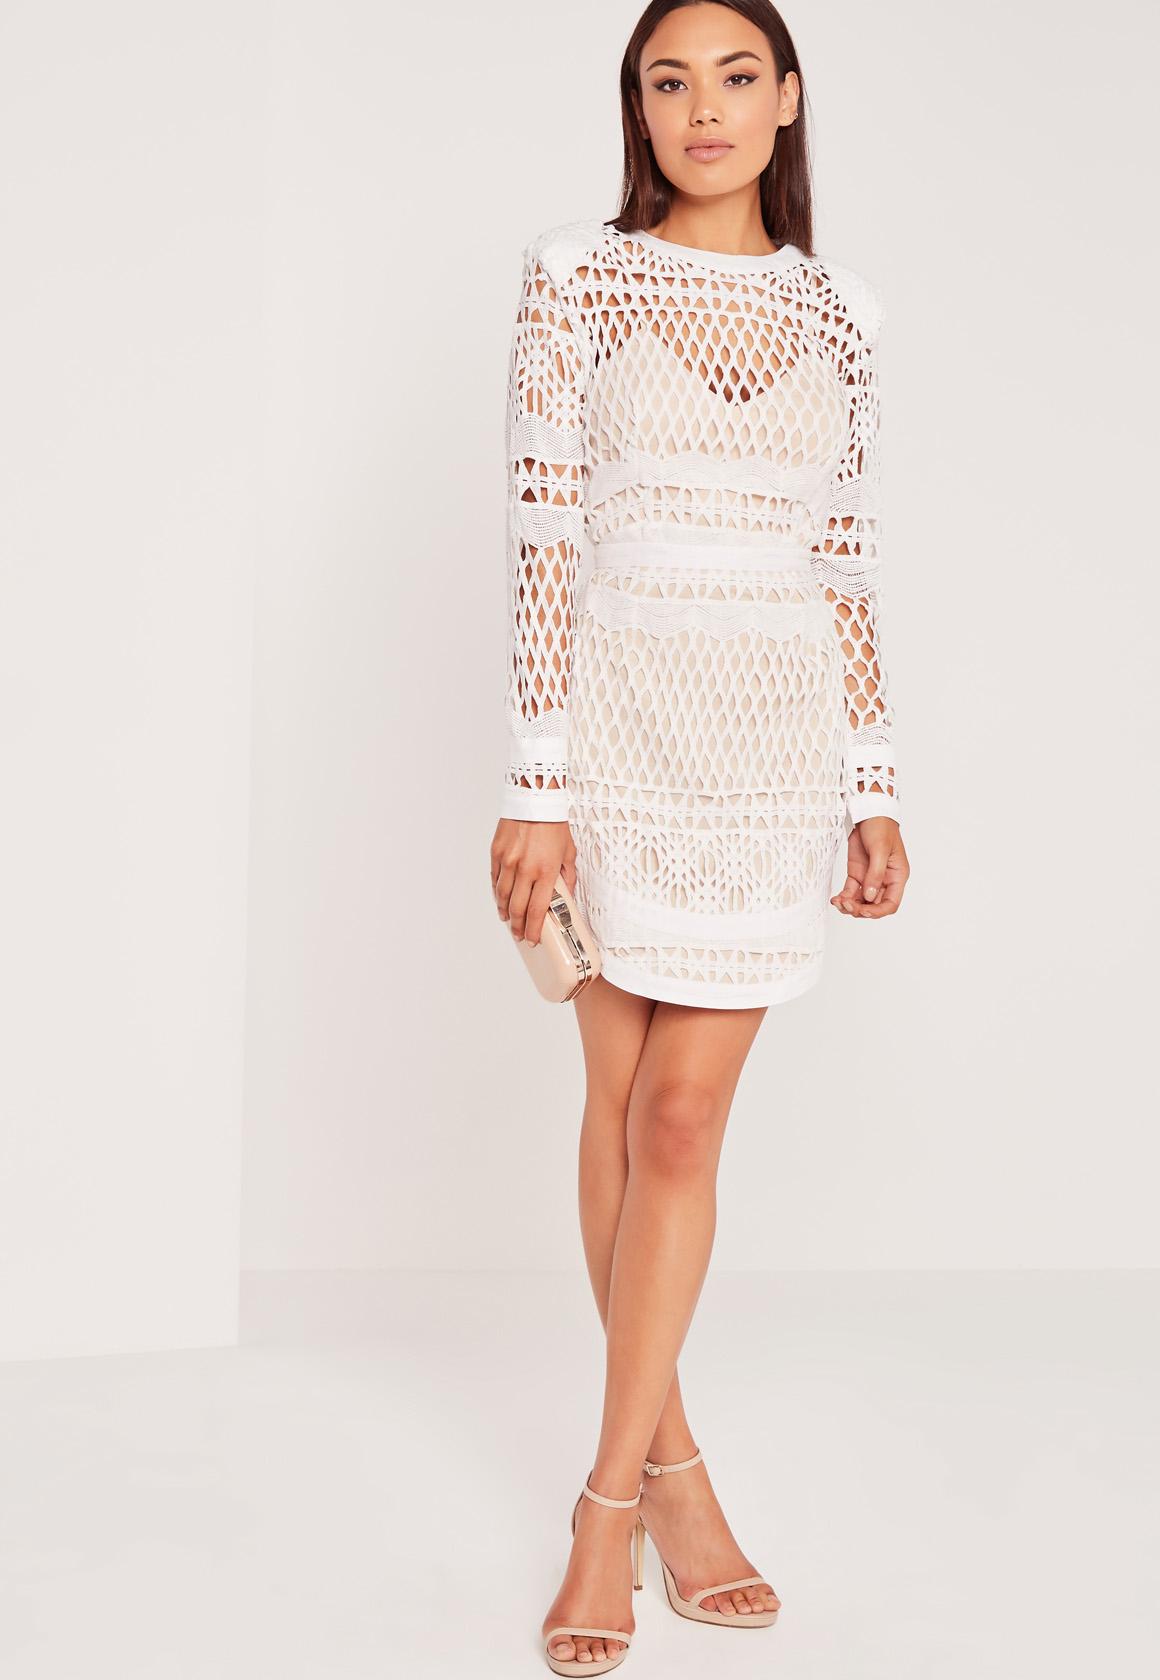 Bodycon dress long sleeve white a line dress next day